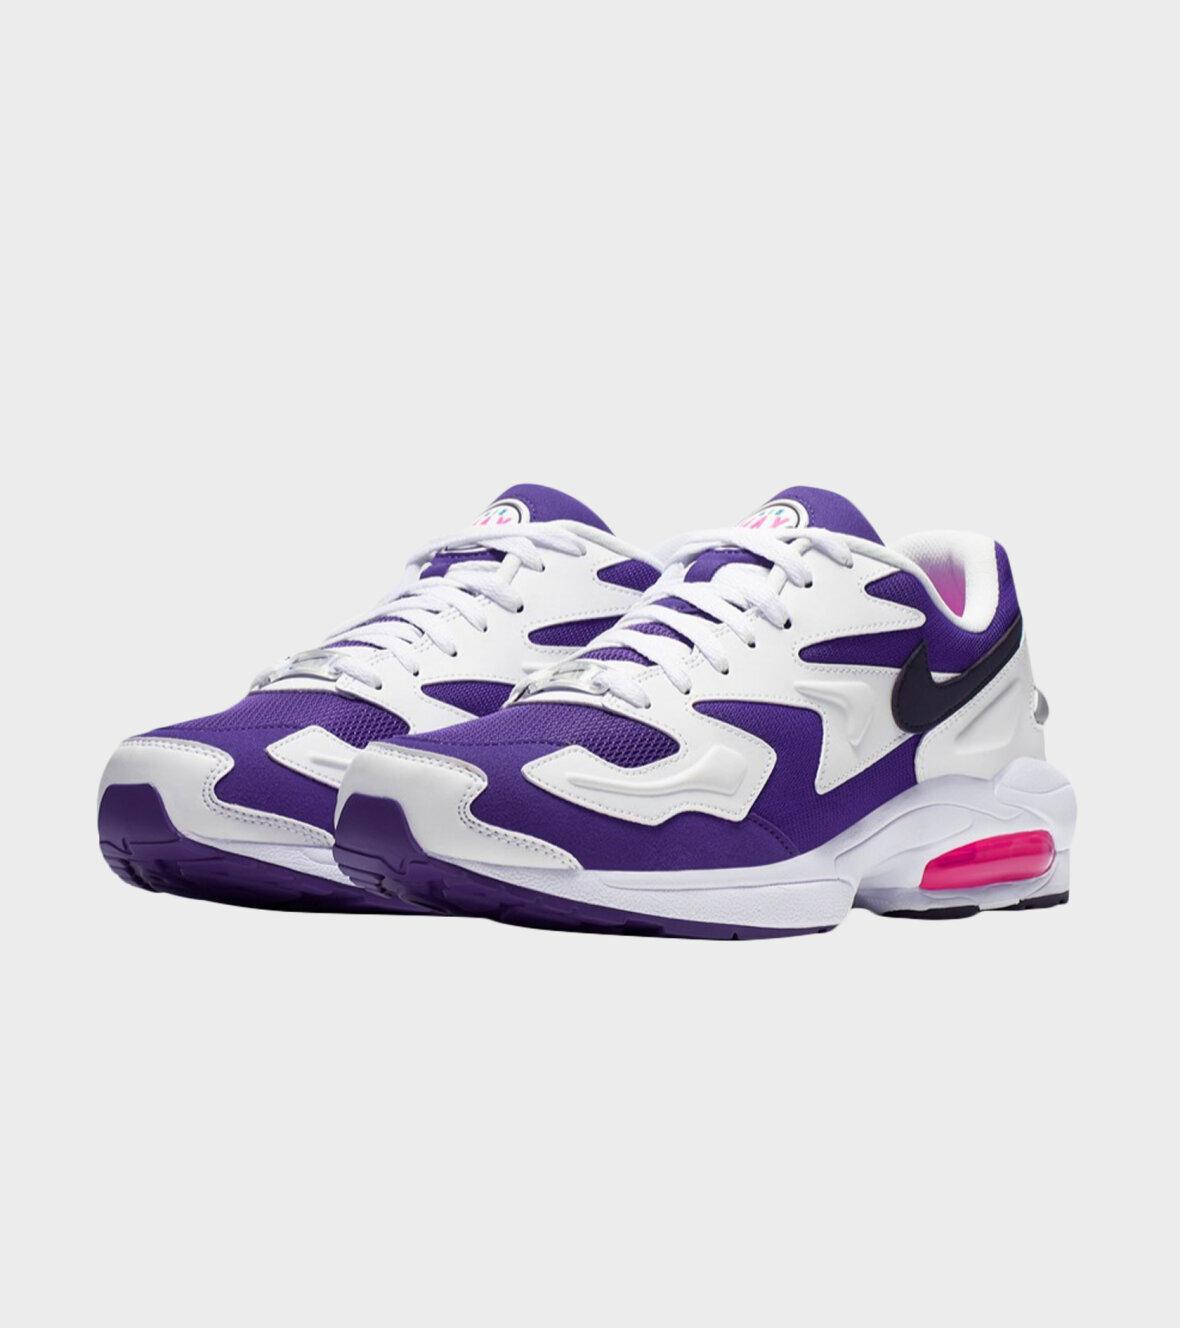 Nike Air Max2 Light Purple dr. Adams